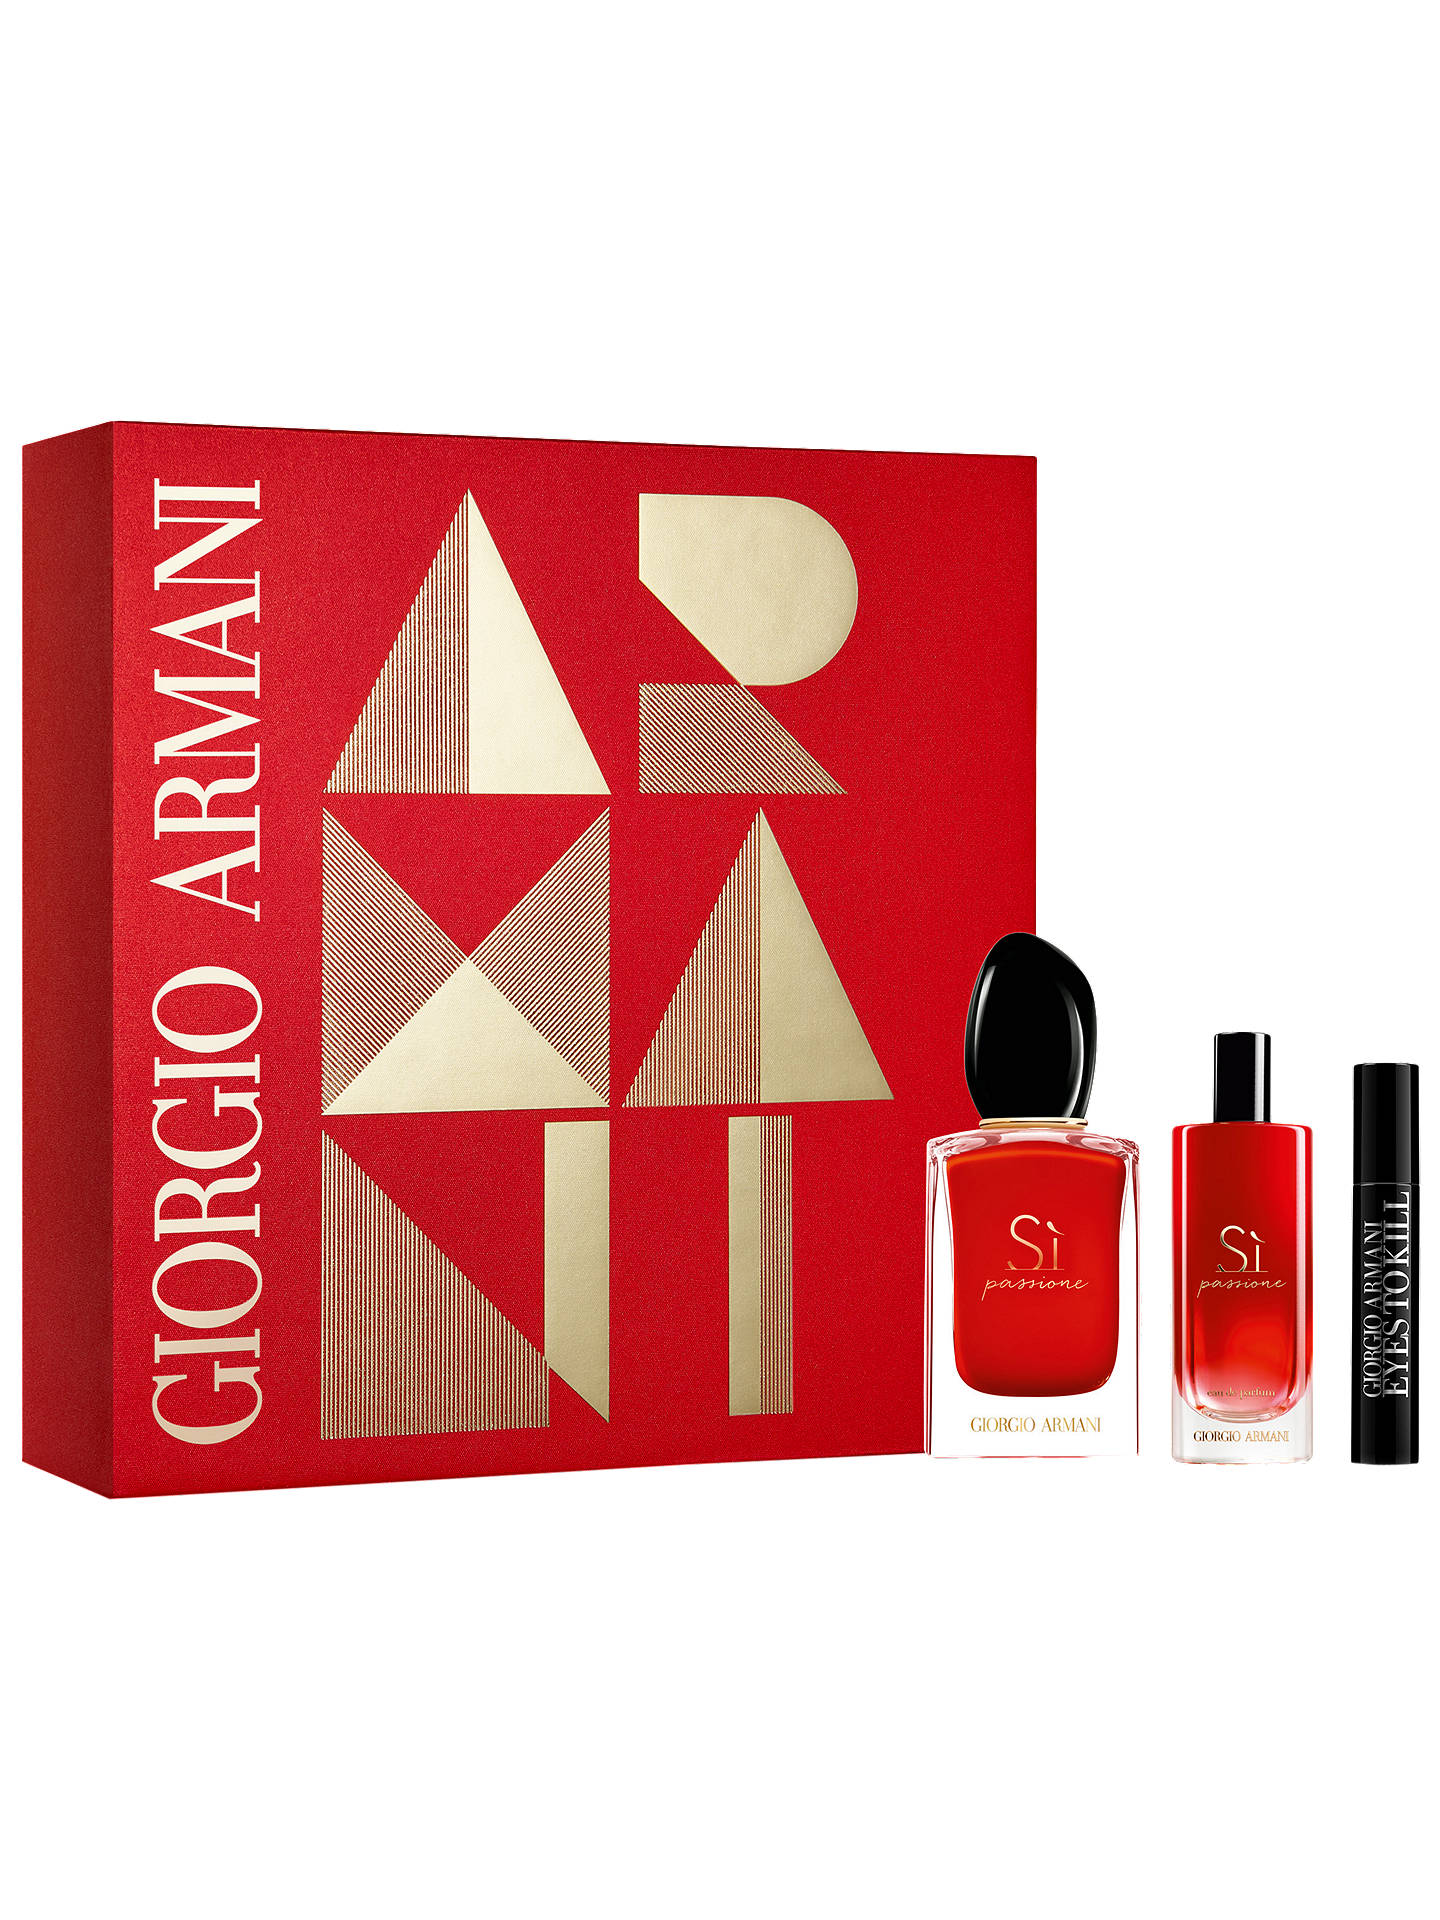 56b57c5d9 Buy Giorgio Armani Sì Passione Eau de Parfum 50ml + Mascara Gift Set Online  at johnlewis